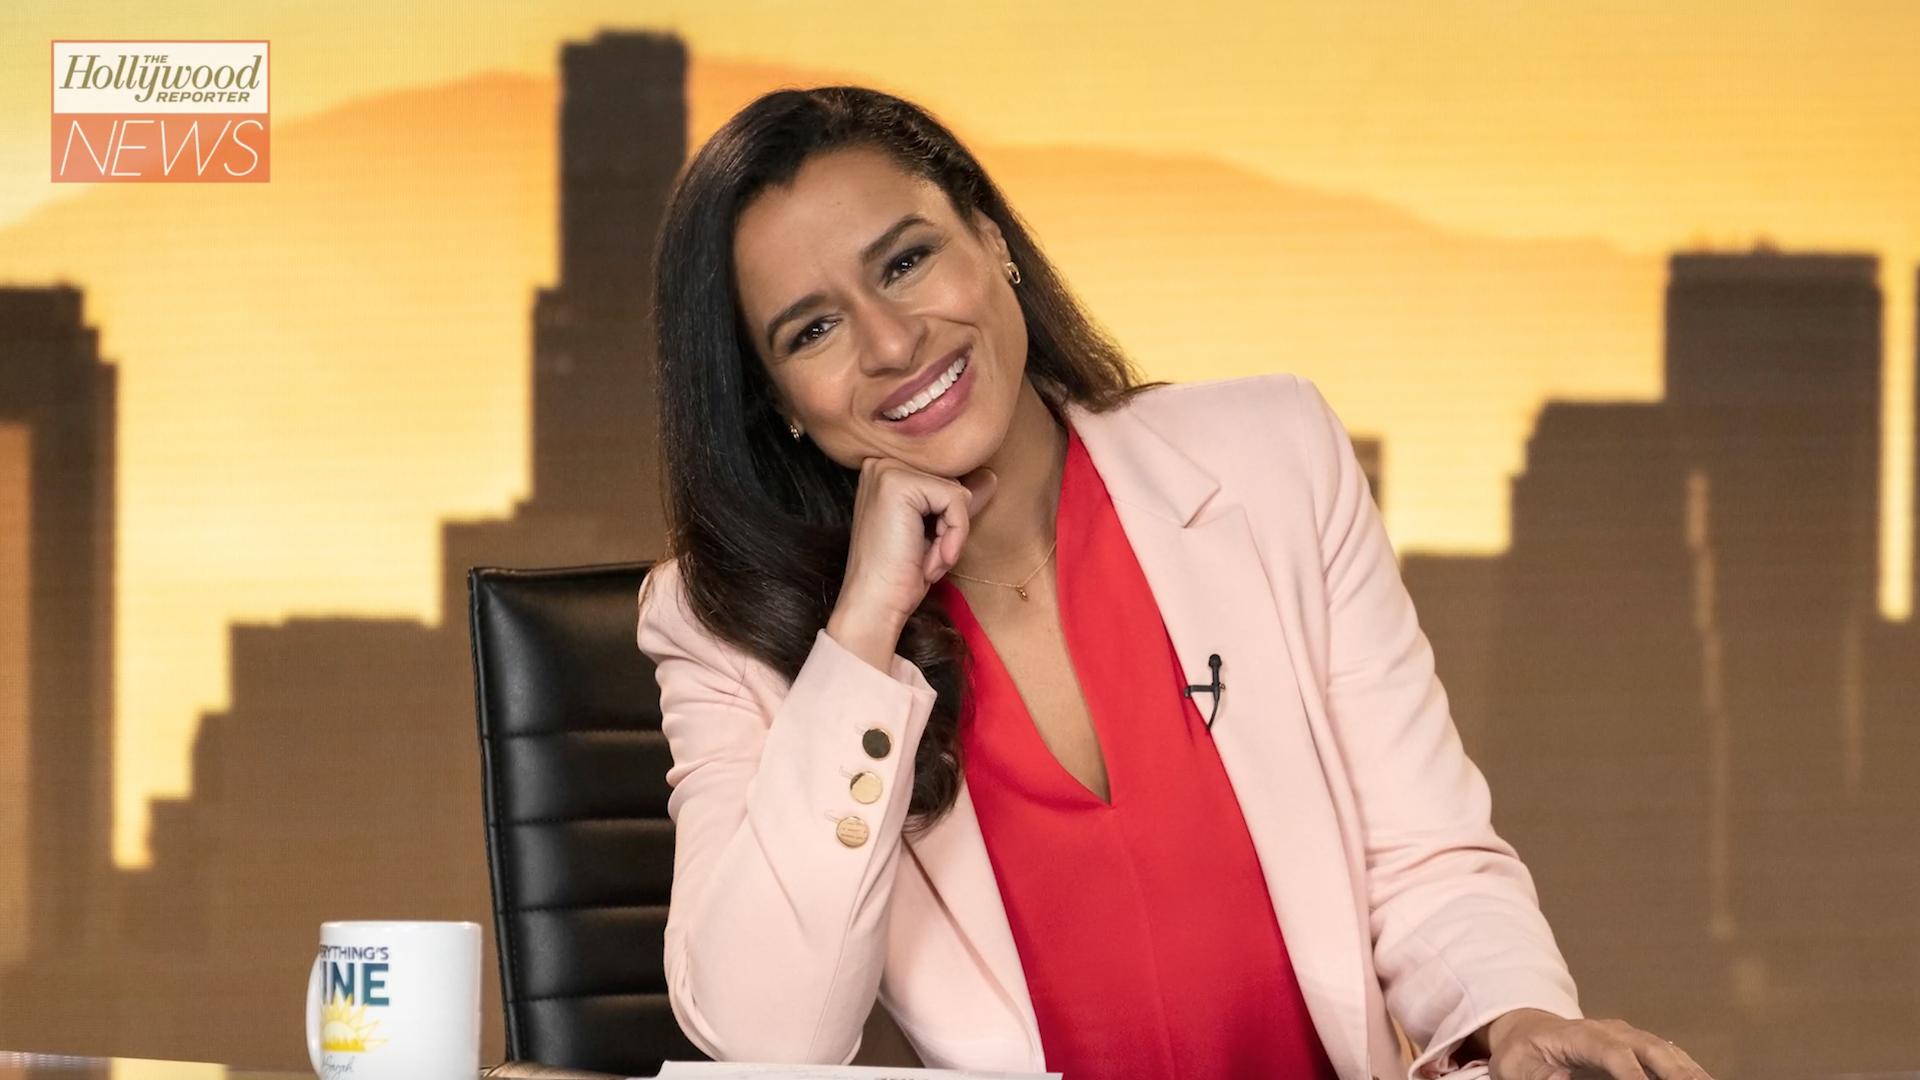 Sarah Cooper Workplace Comedy Gets CBS Pilot Order | THR News